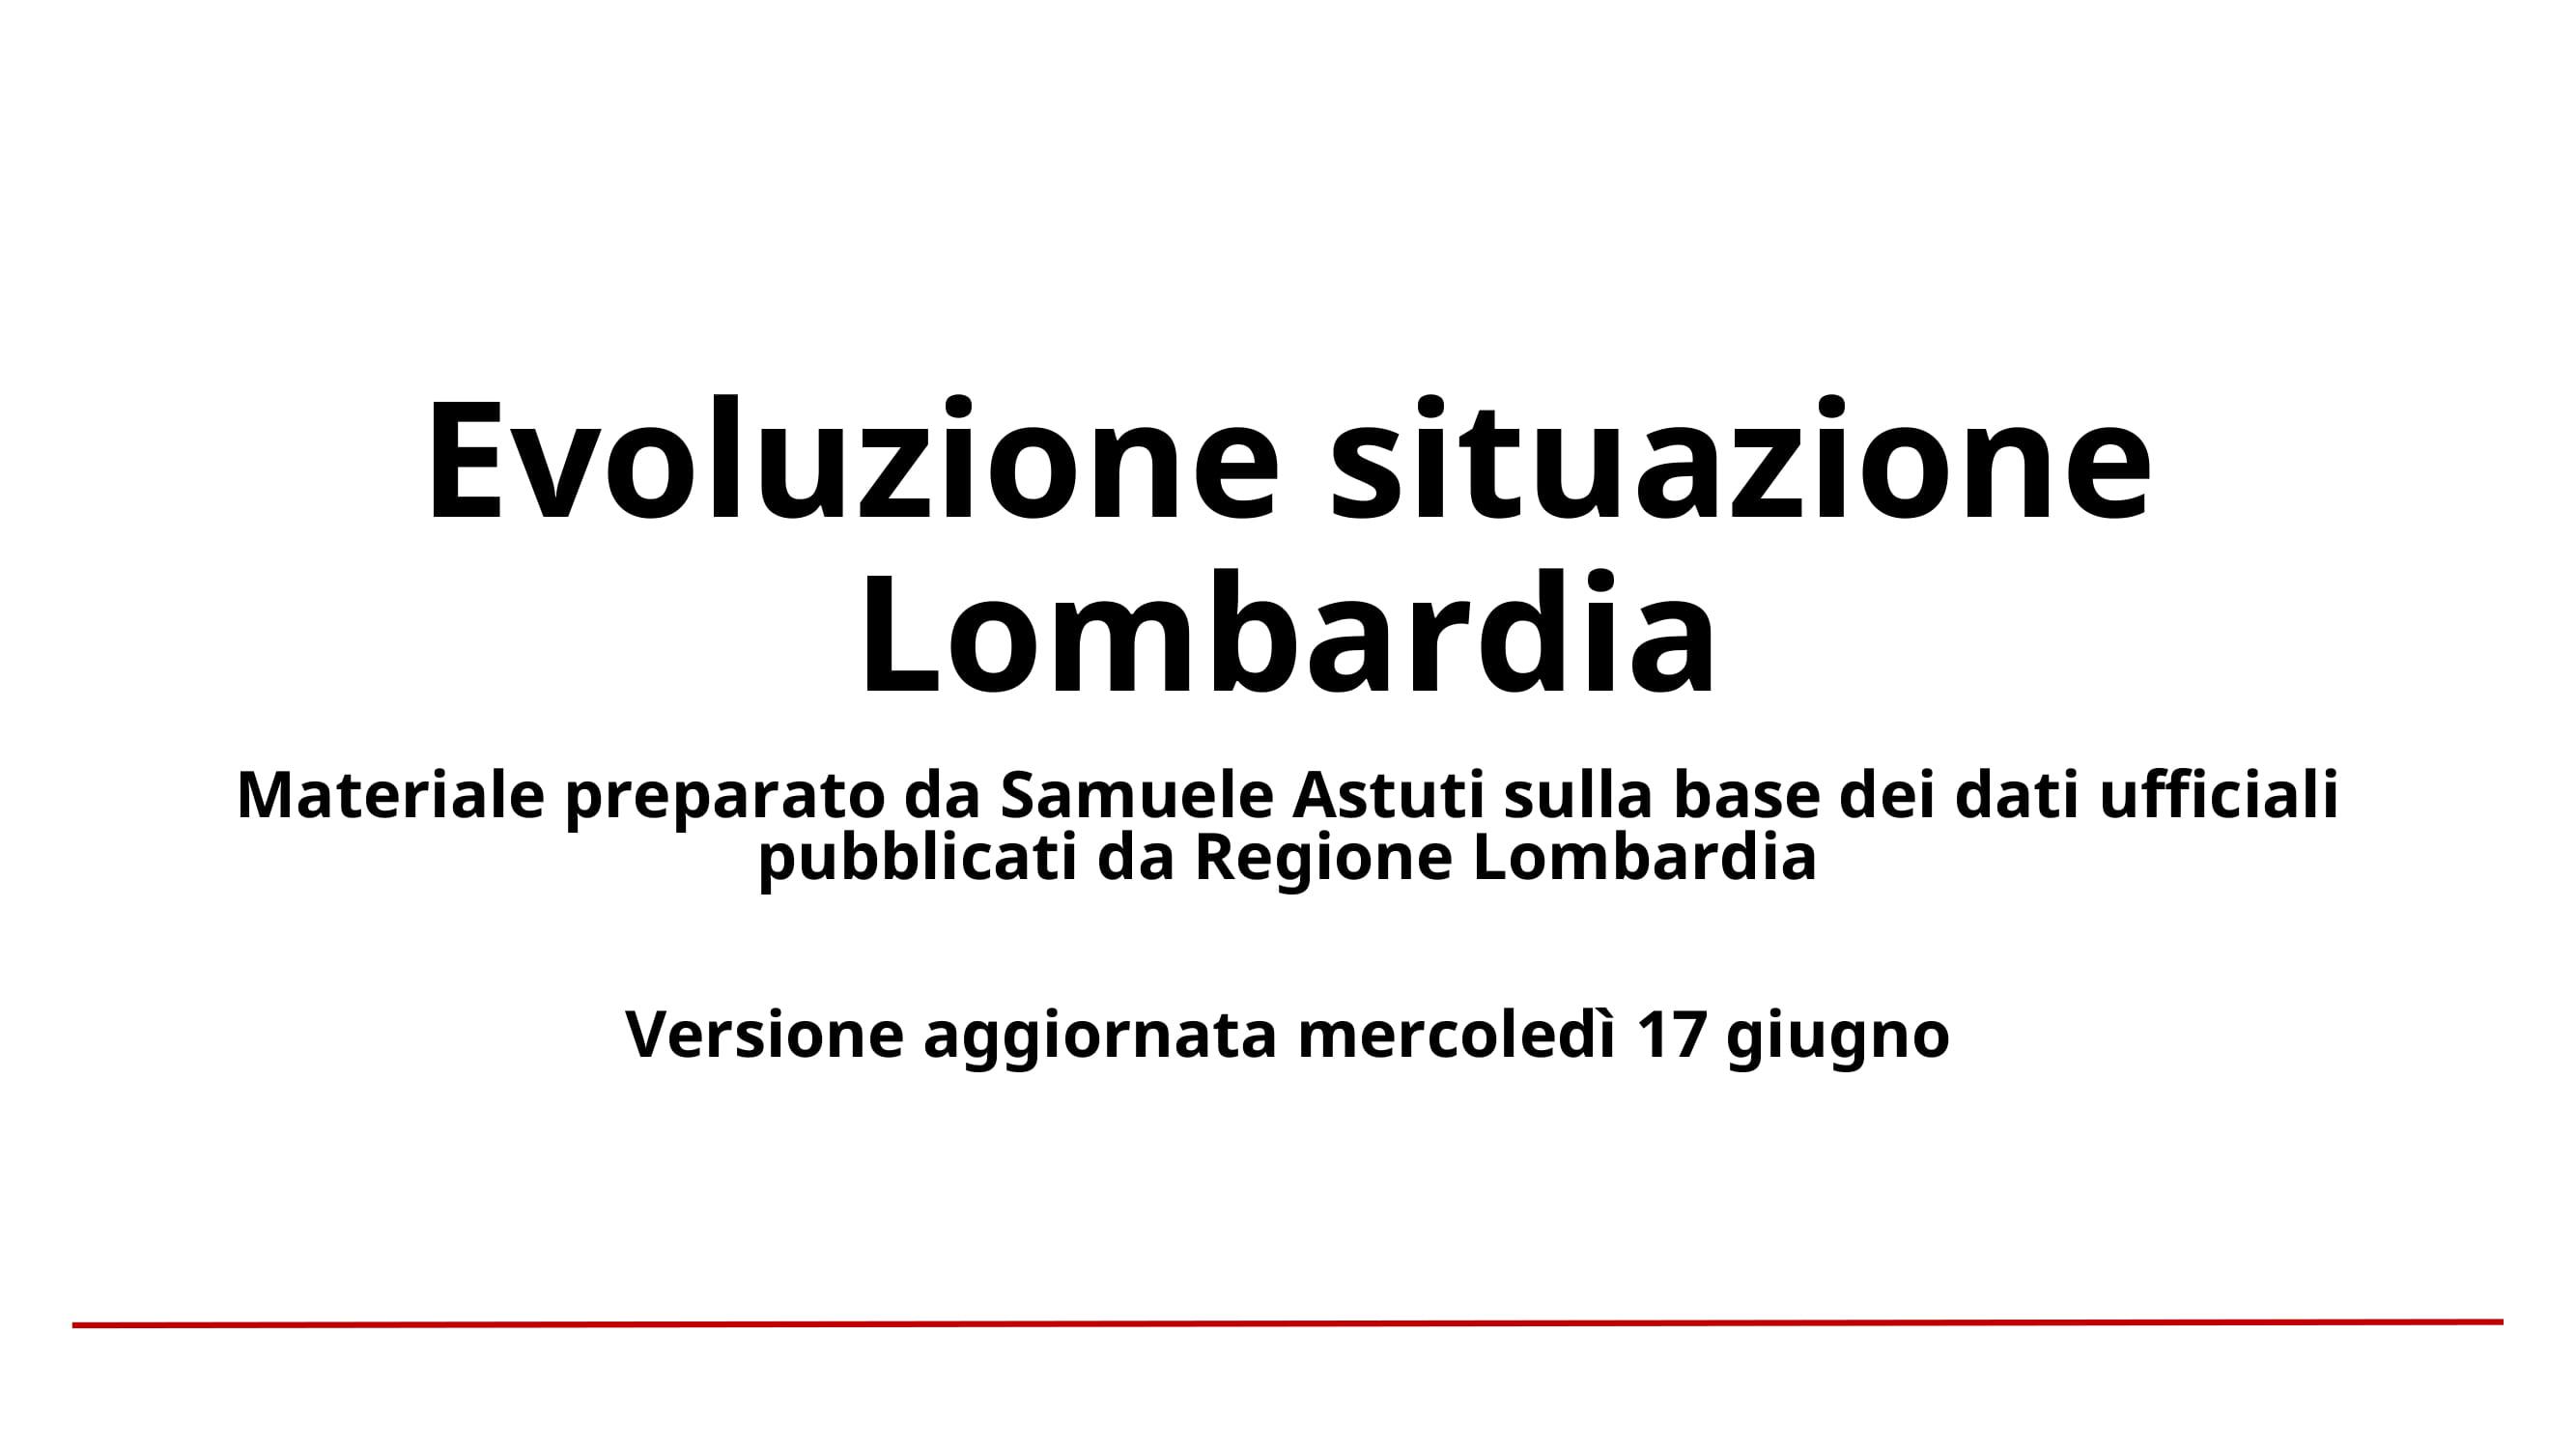 200617-EvoluzioneSituazioneLombardia-01